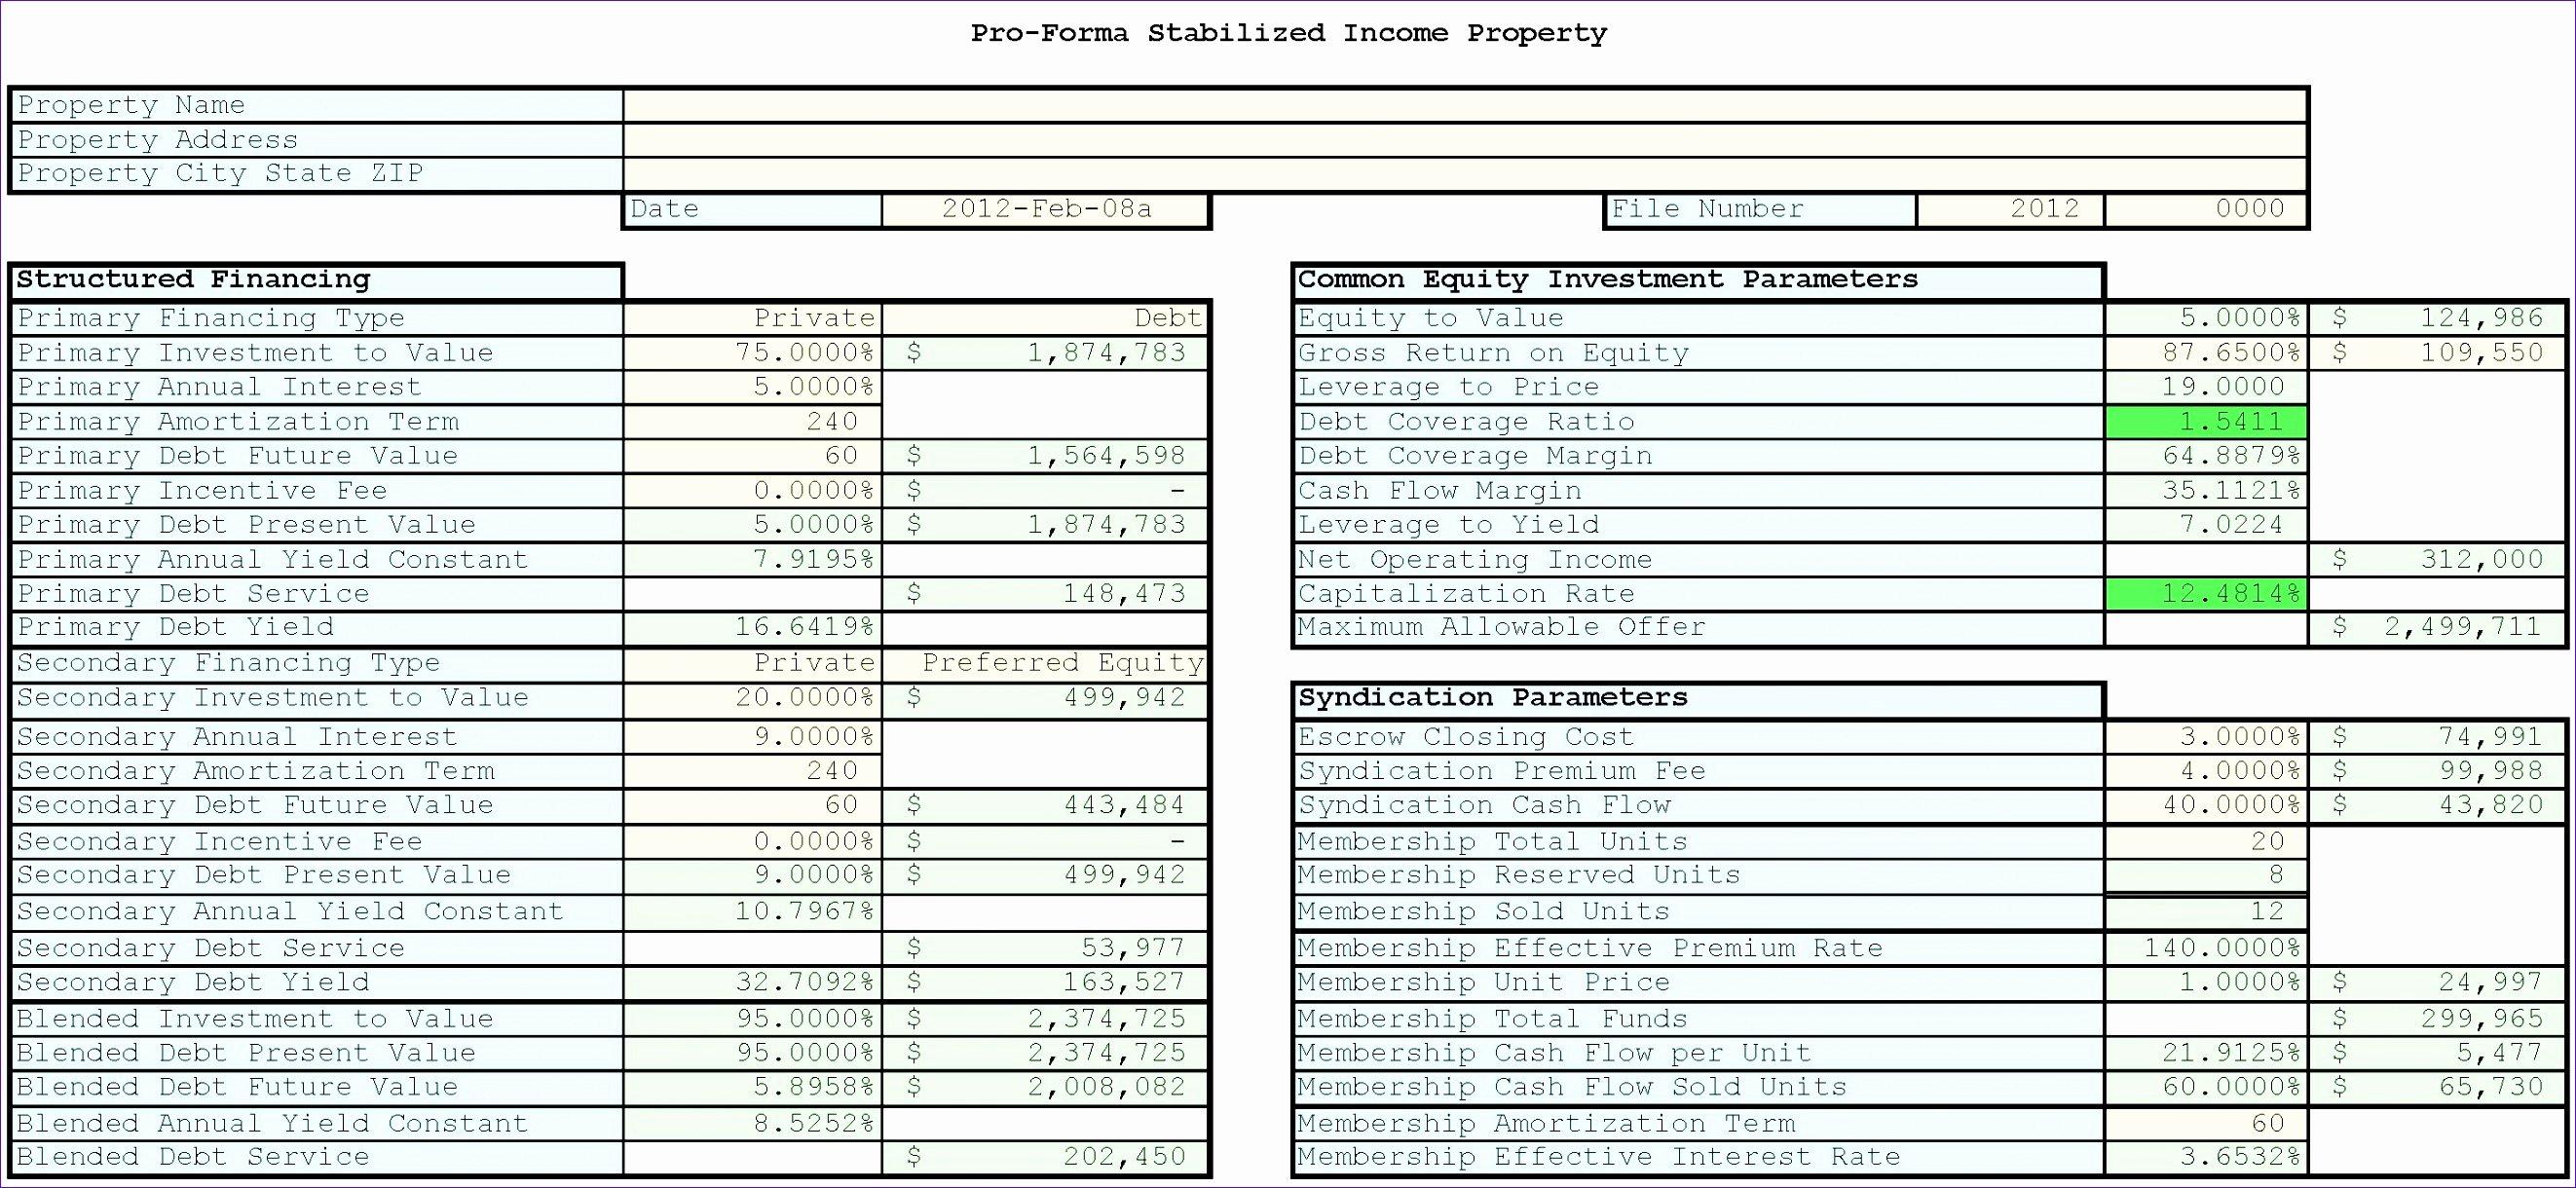 Estate Planning Template Excel Inspirational Estate Planning Spreadsheet Spreadsheet softwar Real